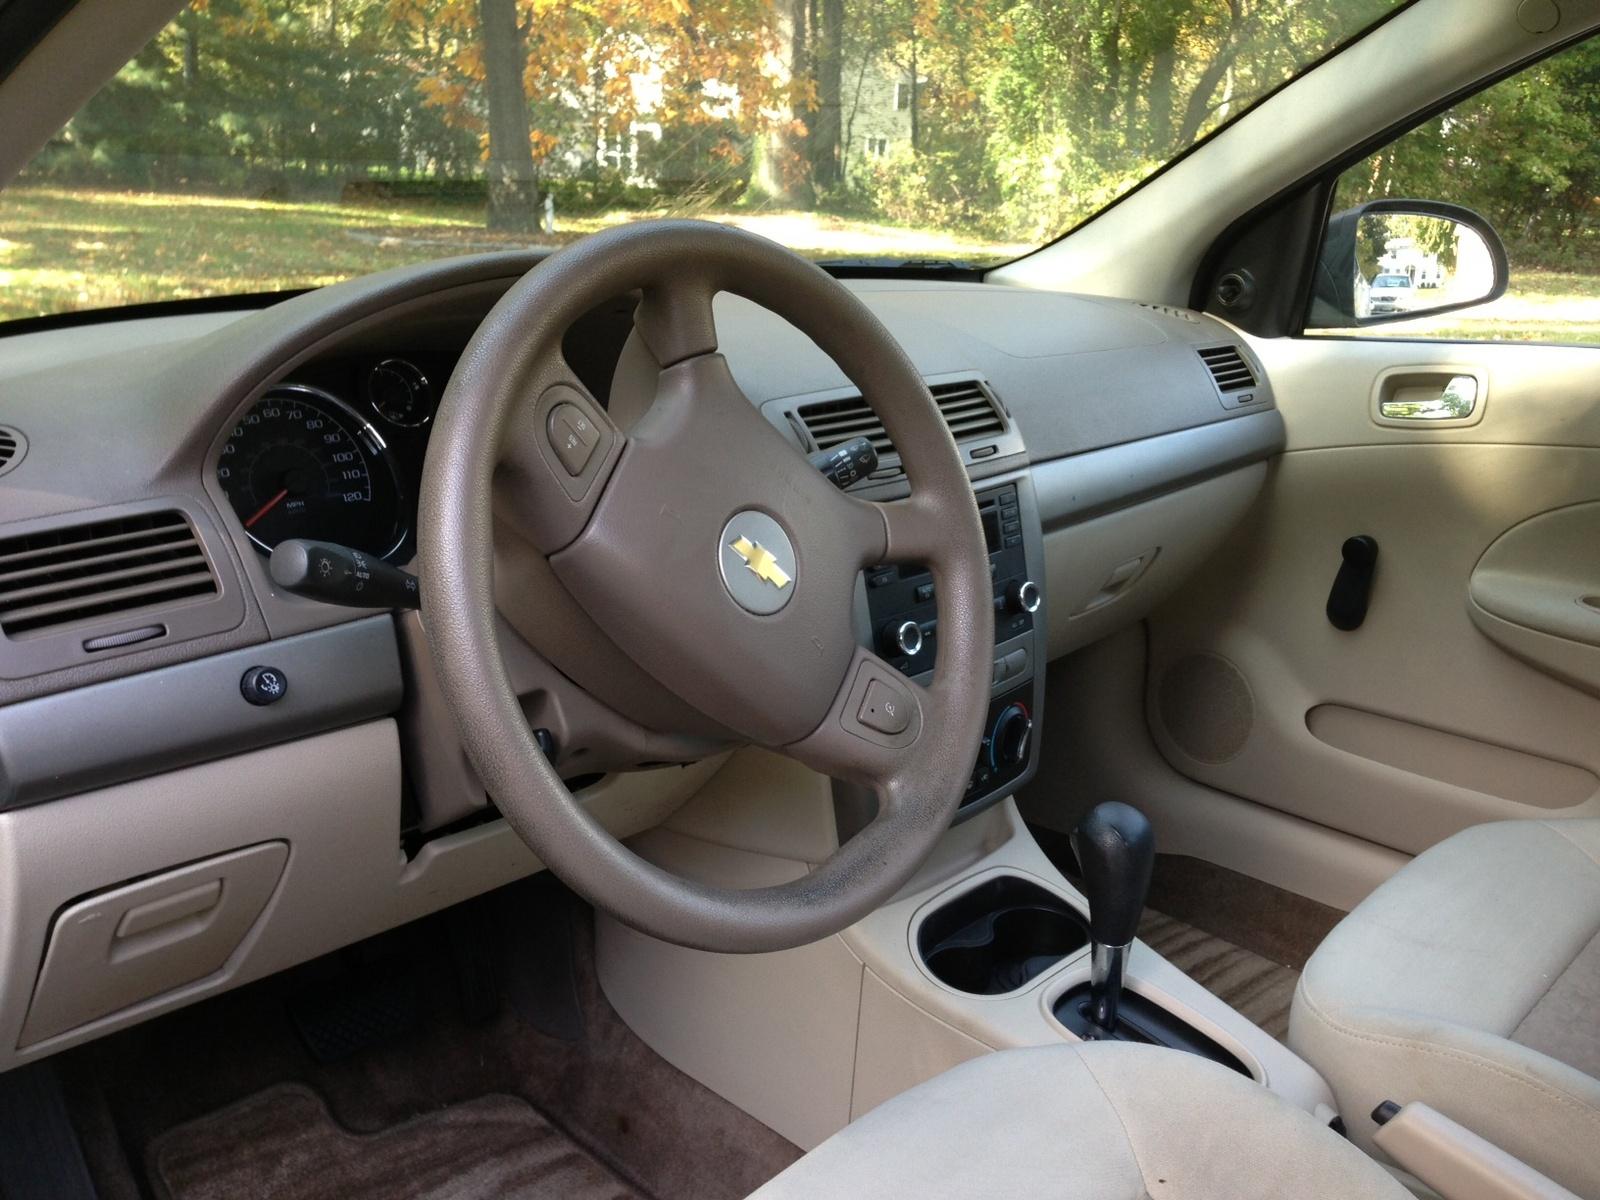 2008 Chevrolet Silverado 1500 >> 2005 Chevrolet Cobalt - Pictures - CarGurus